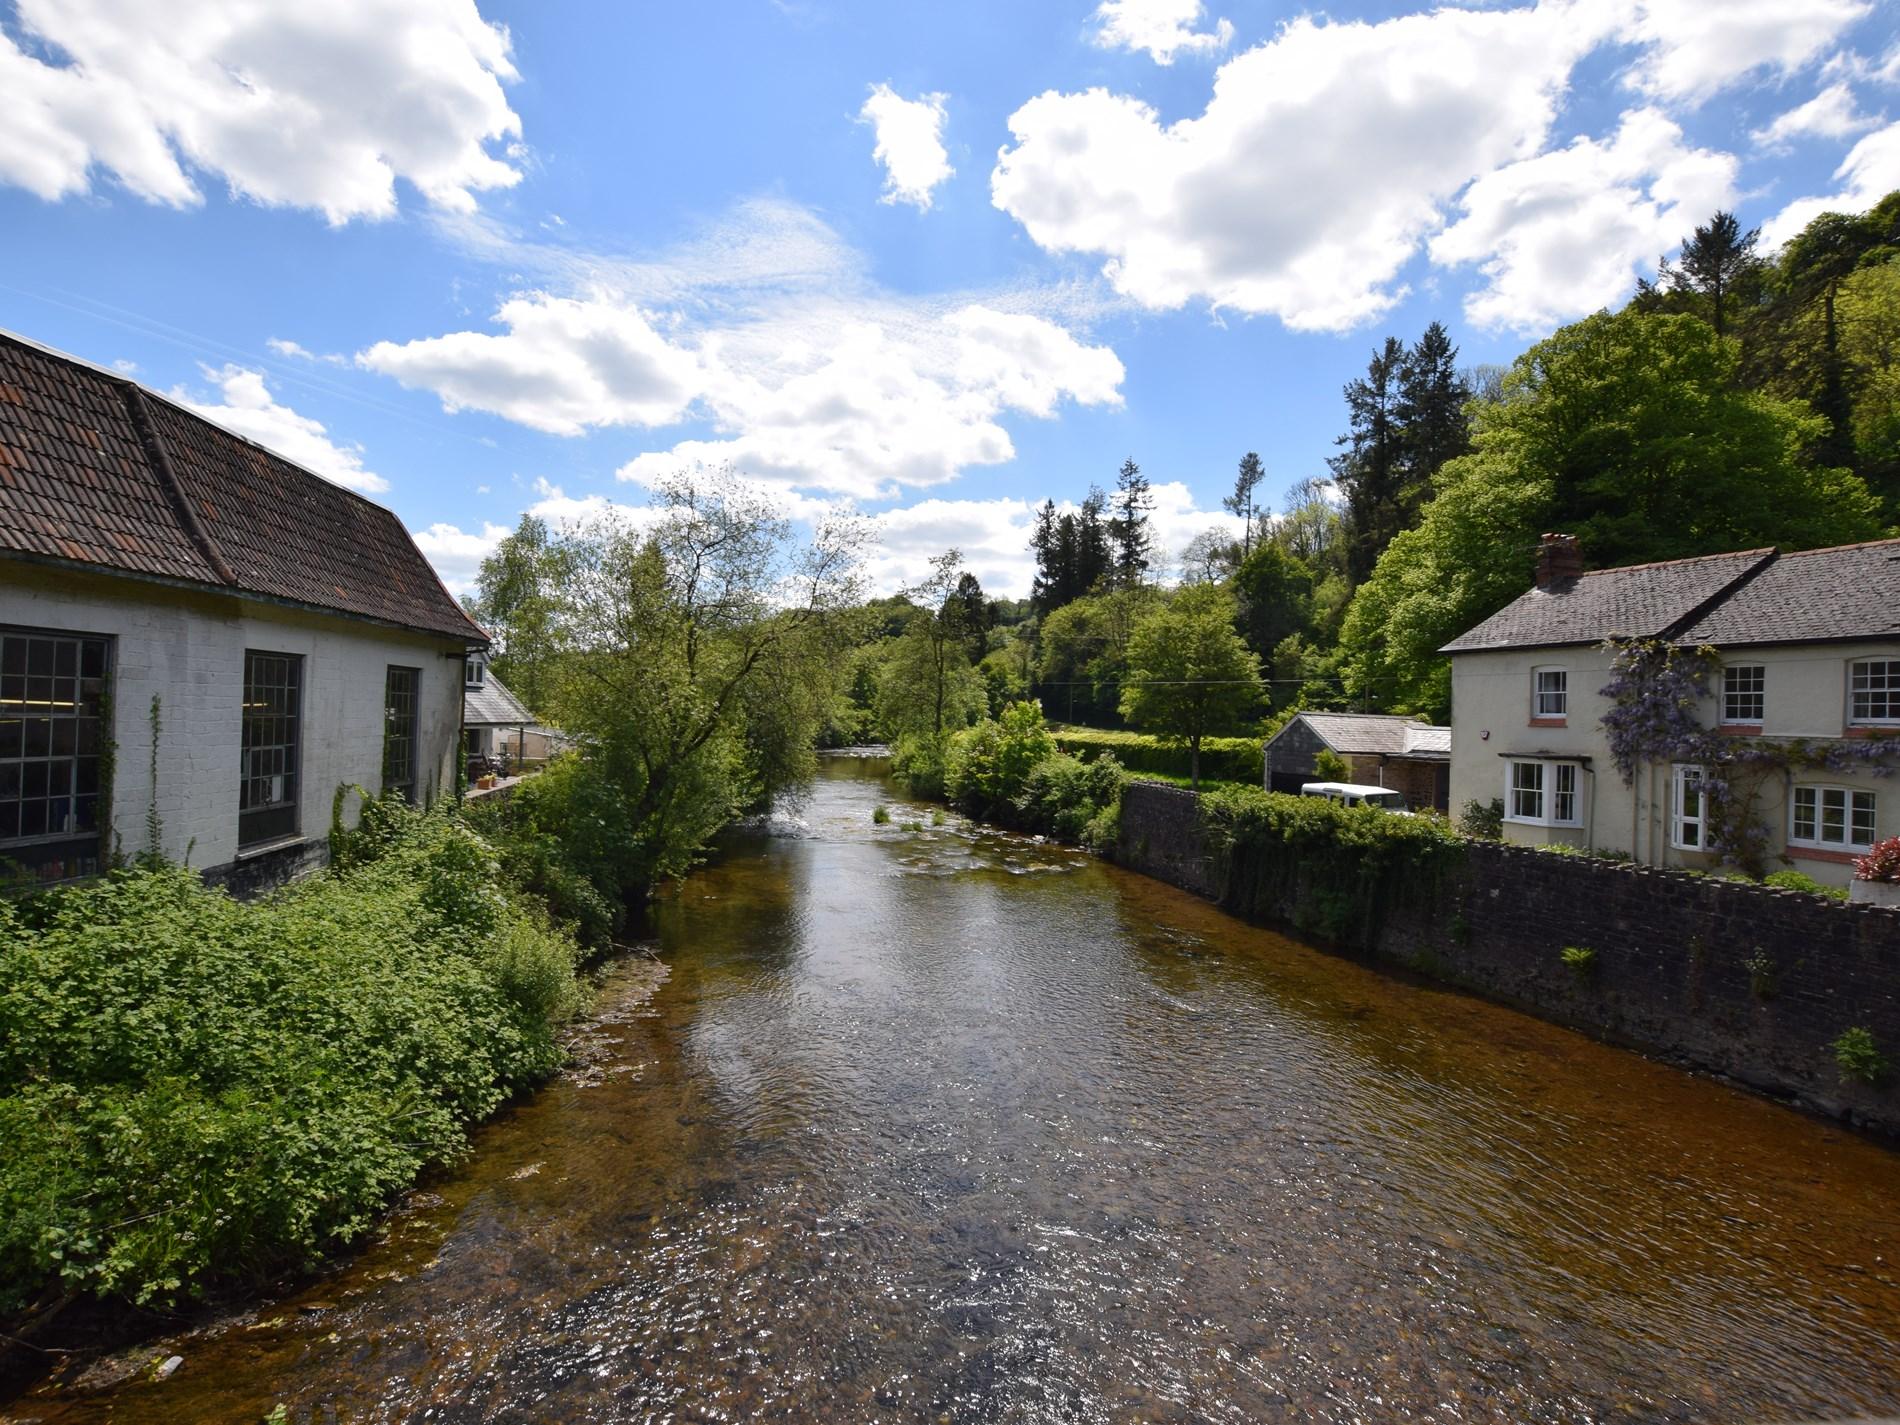 The pretty village of Dulverton